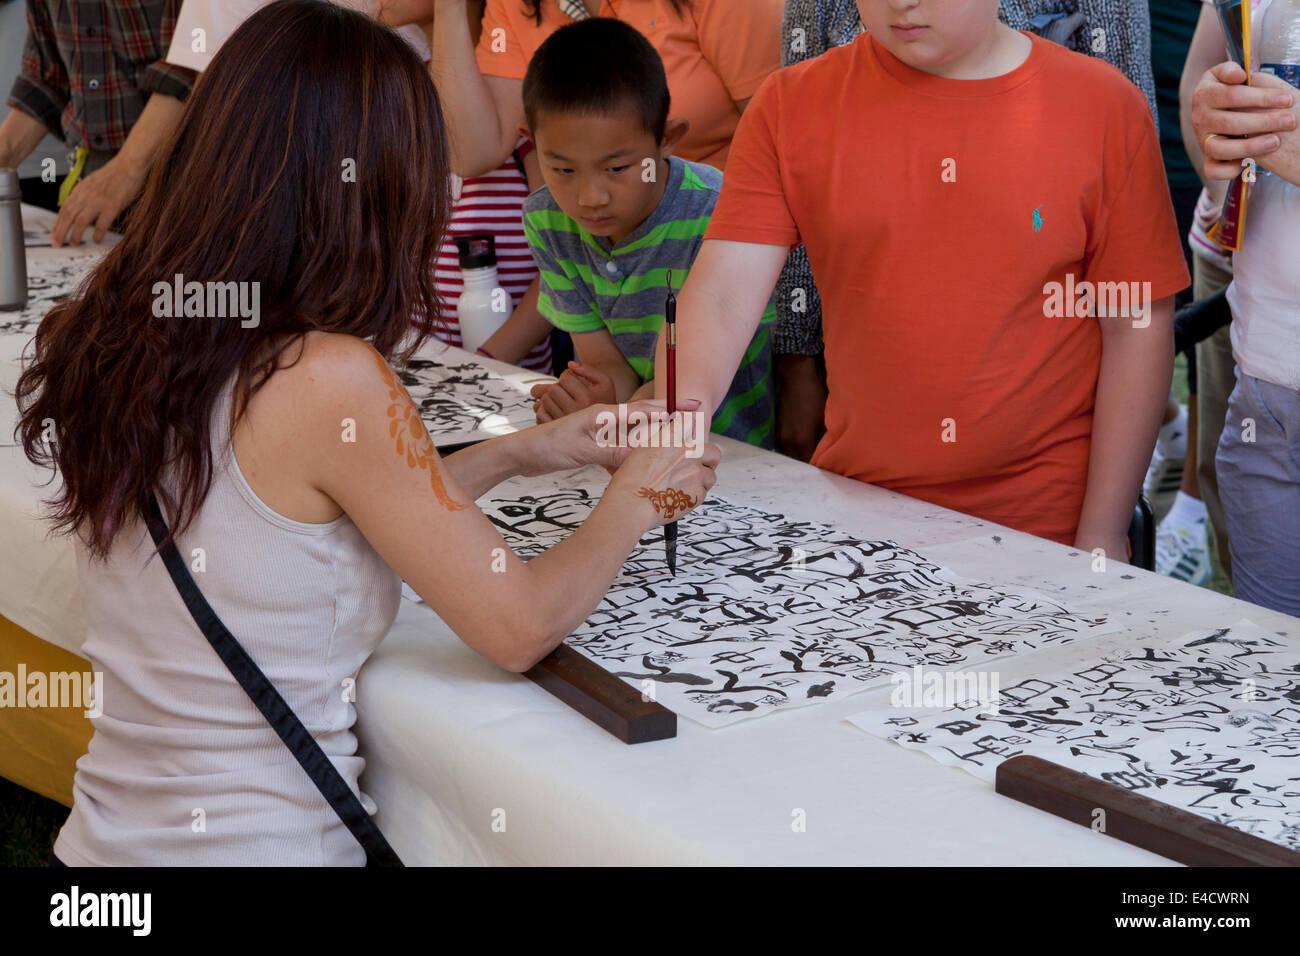 Woman teaching boy Chinese calligraphy - Stock Image